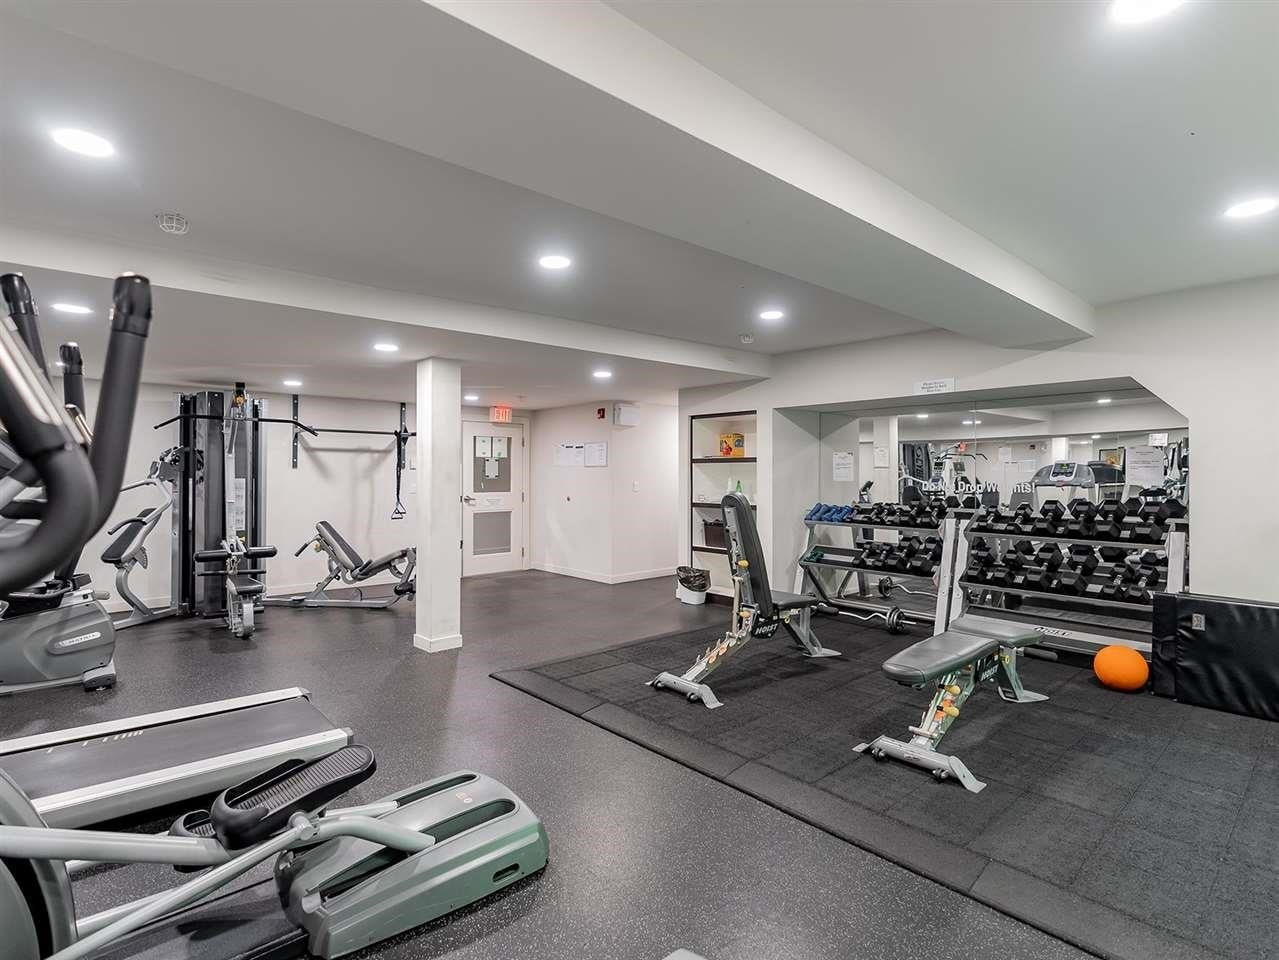 506 1677 LLOYD AVENUE - Pemberton NV Apartment/Condo for sale, 1 Bedroom (R2624695) - #23